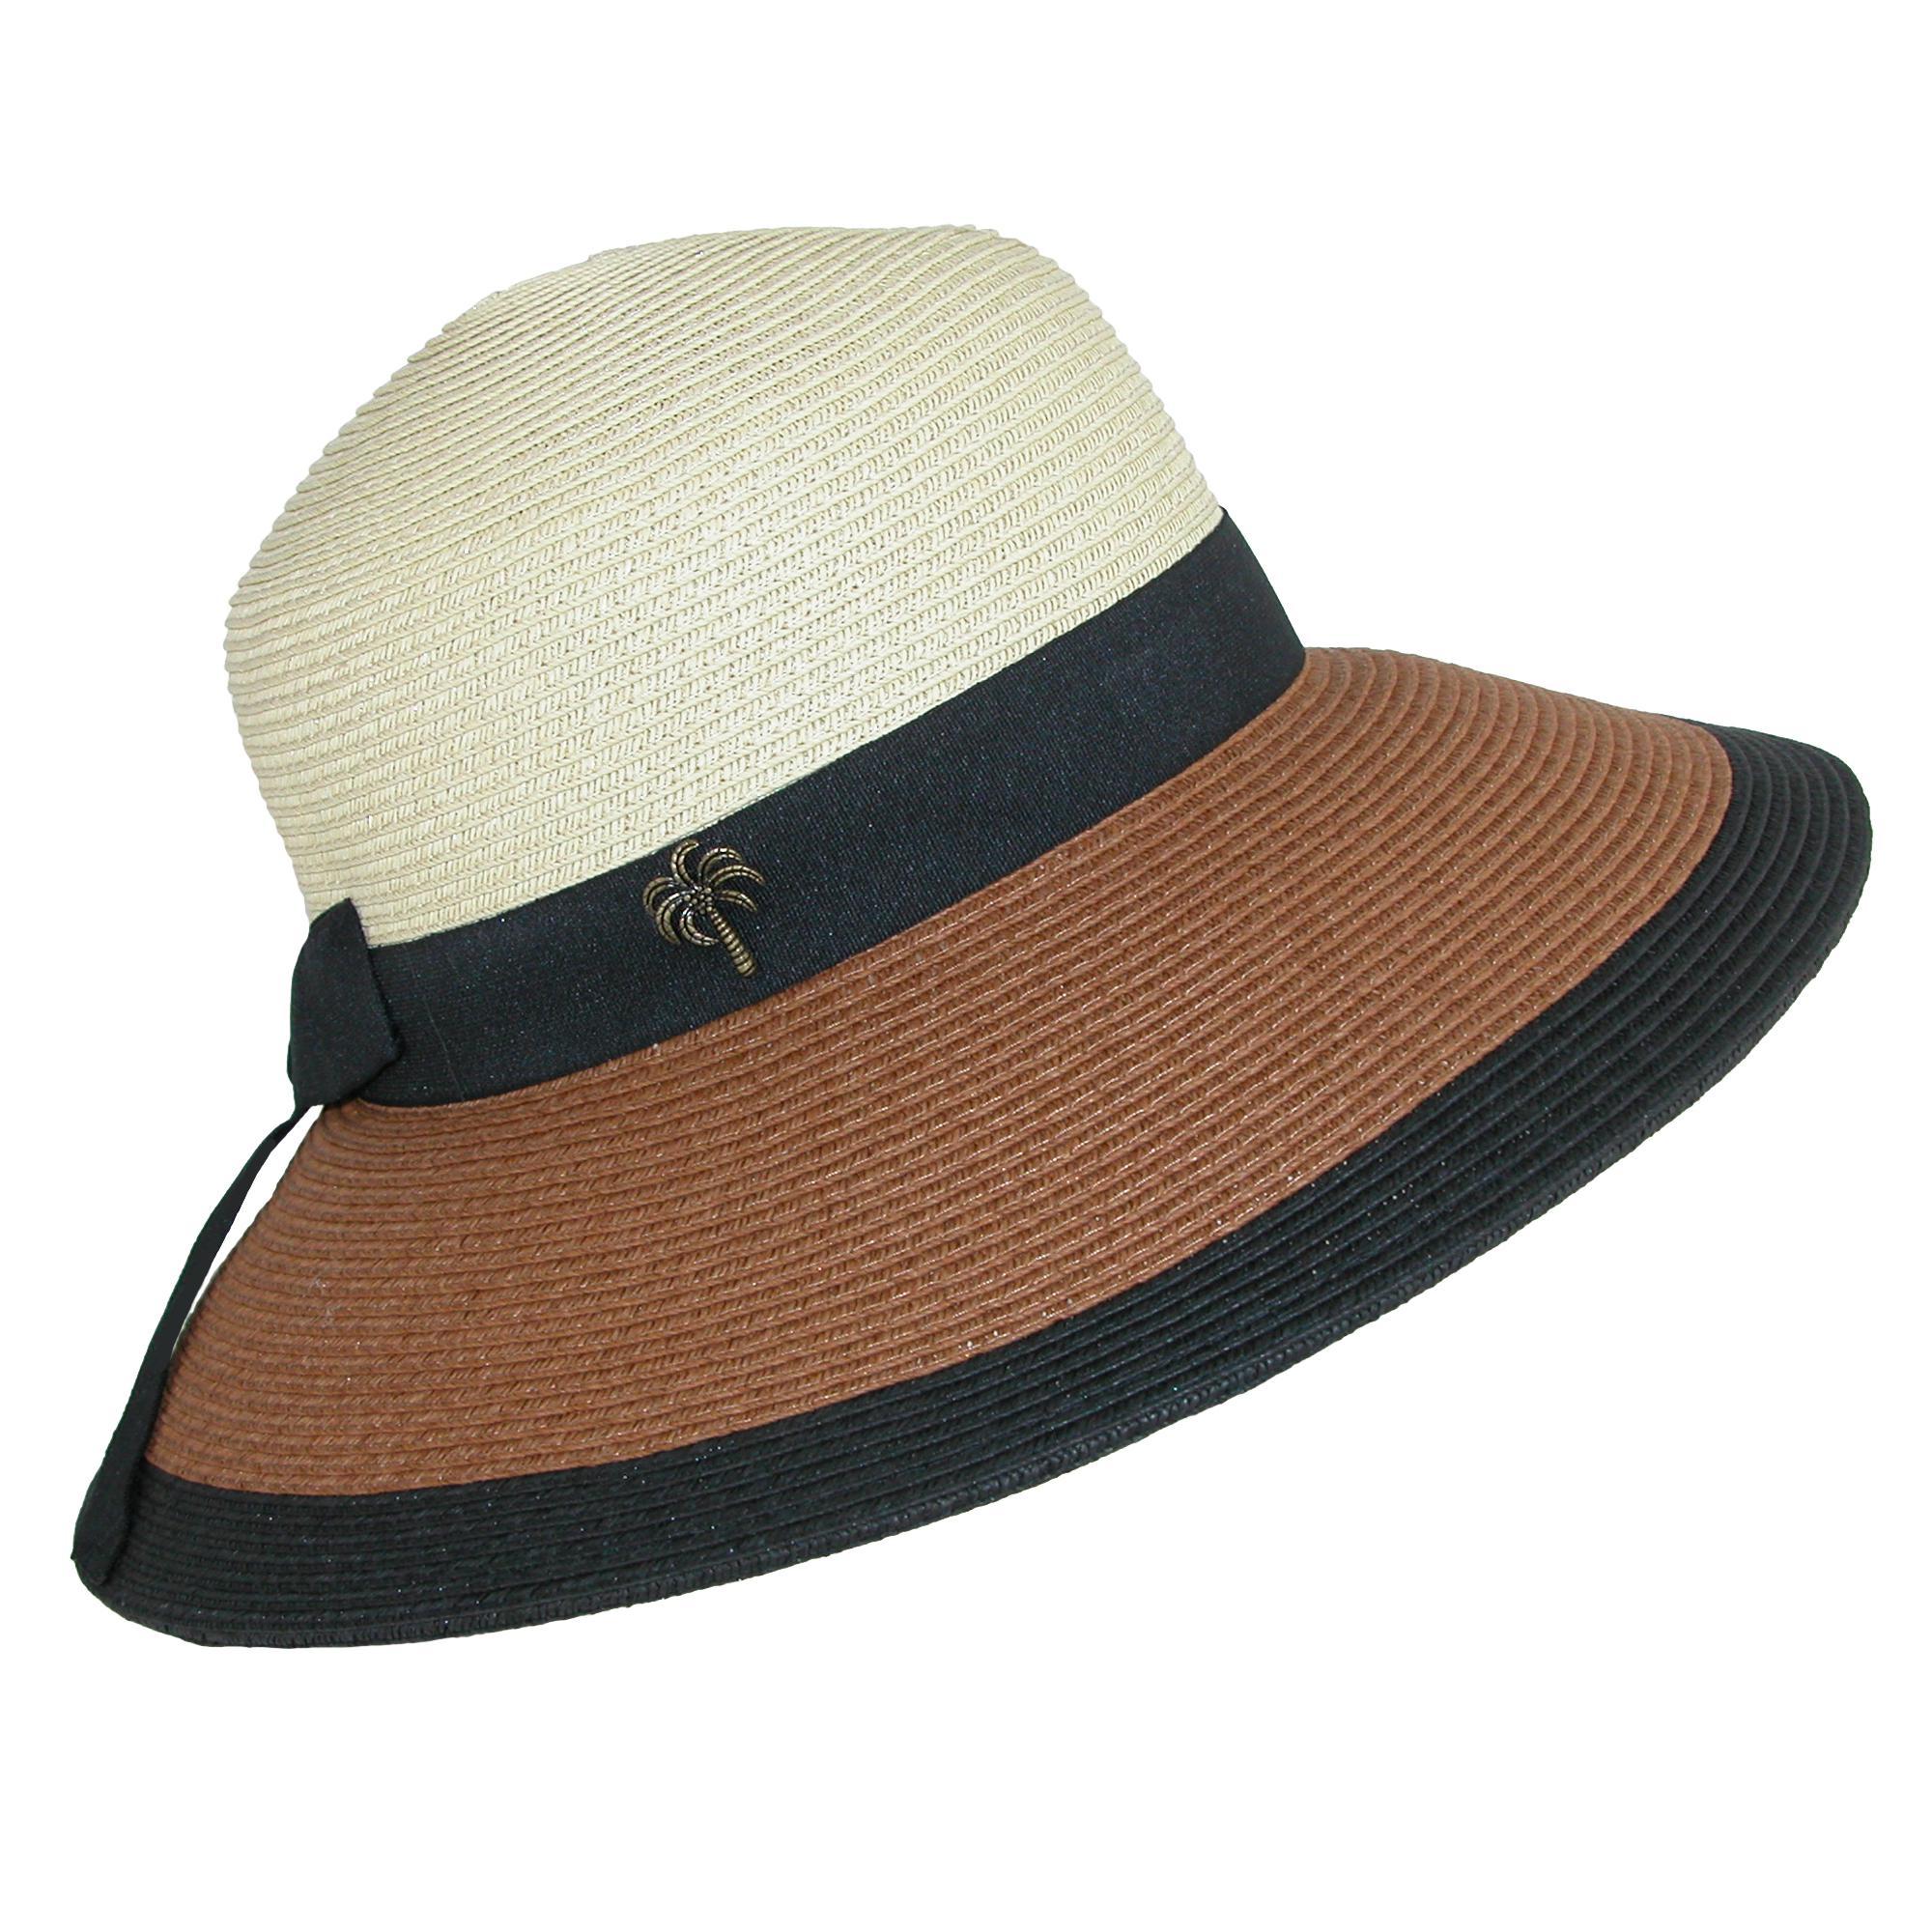 82e0e793 Details about New Sun N Sand Women's Paper Braid Color Block Sun Hat with  Black Ribbon